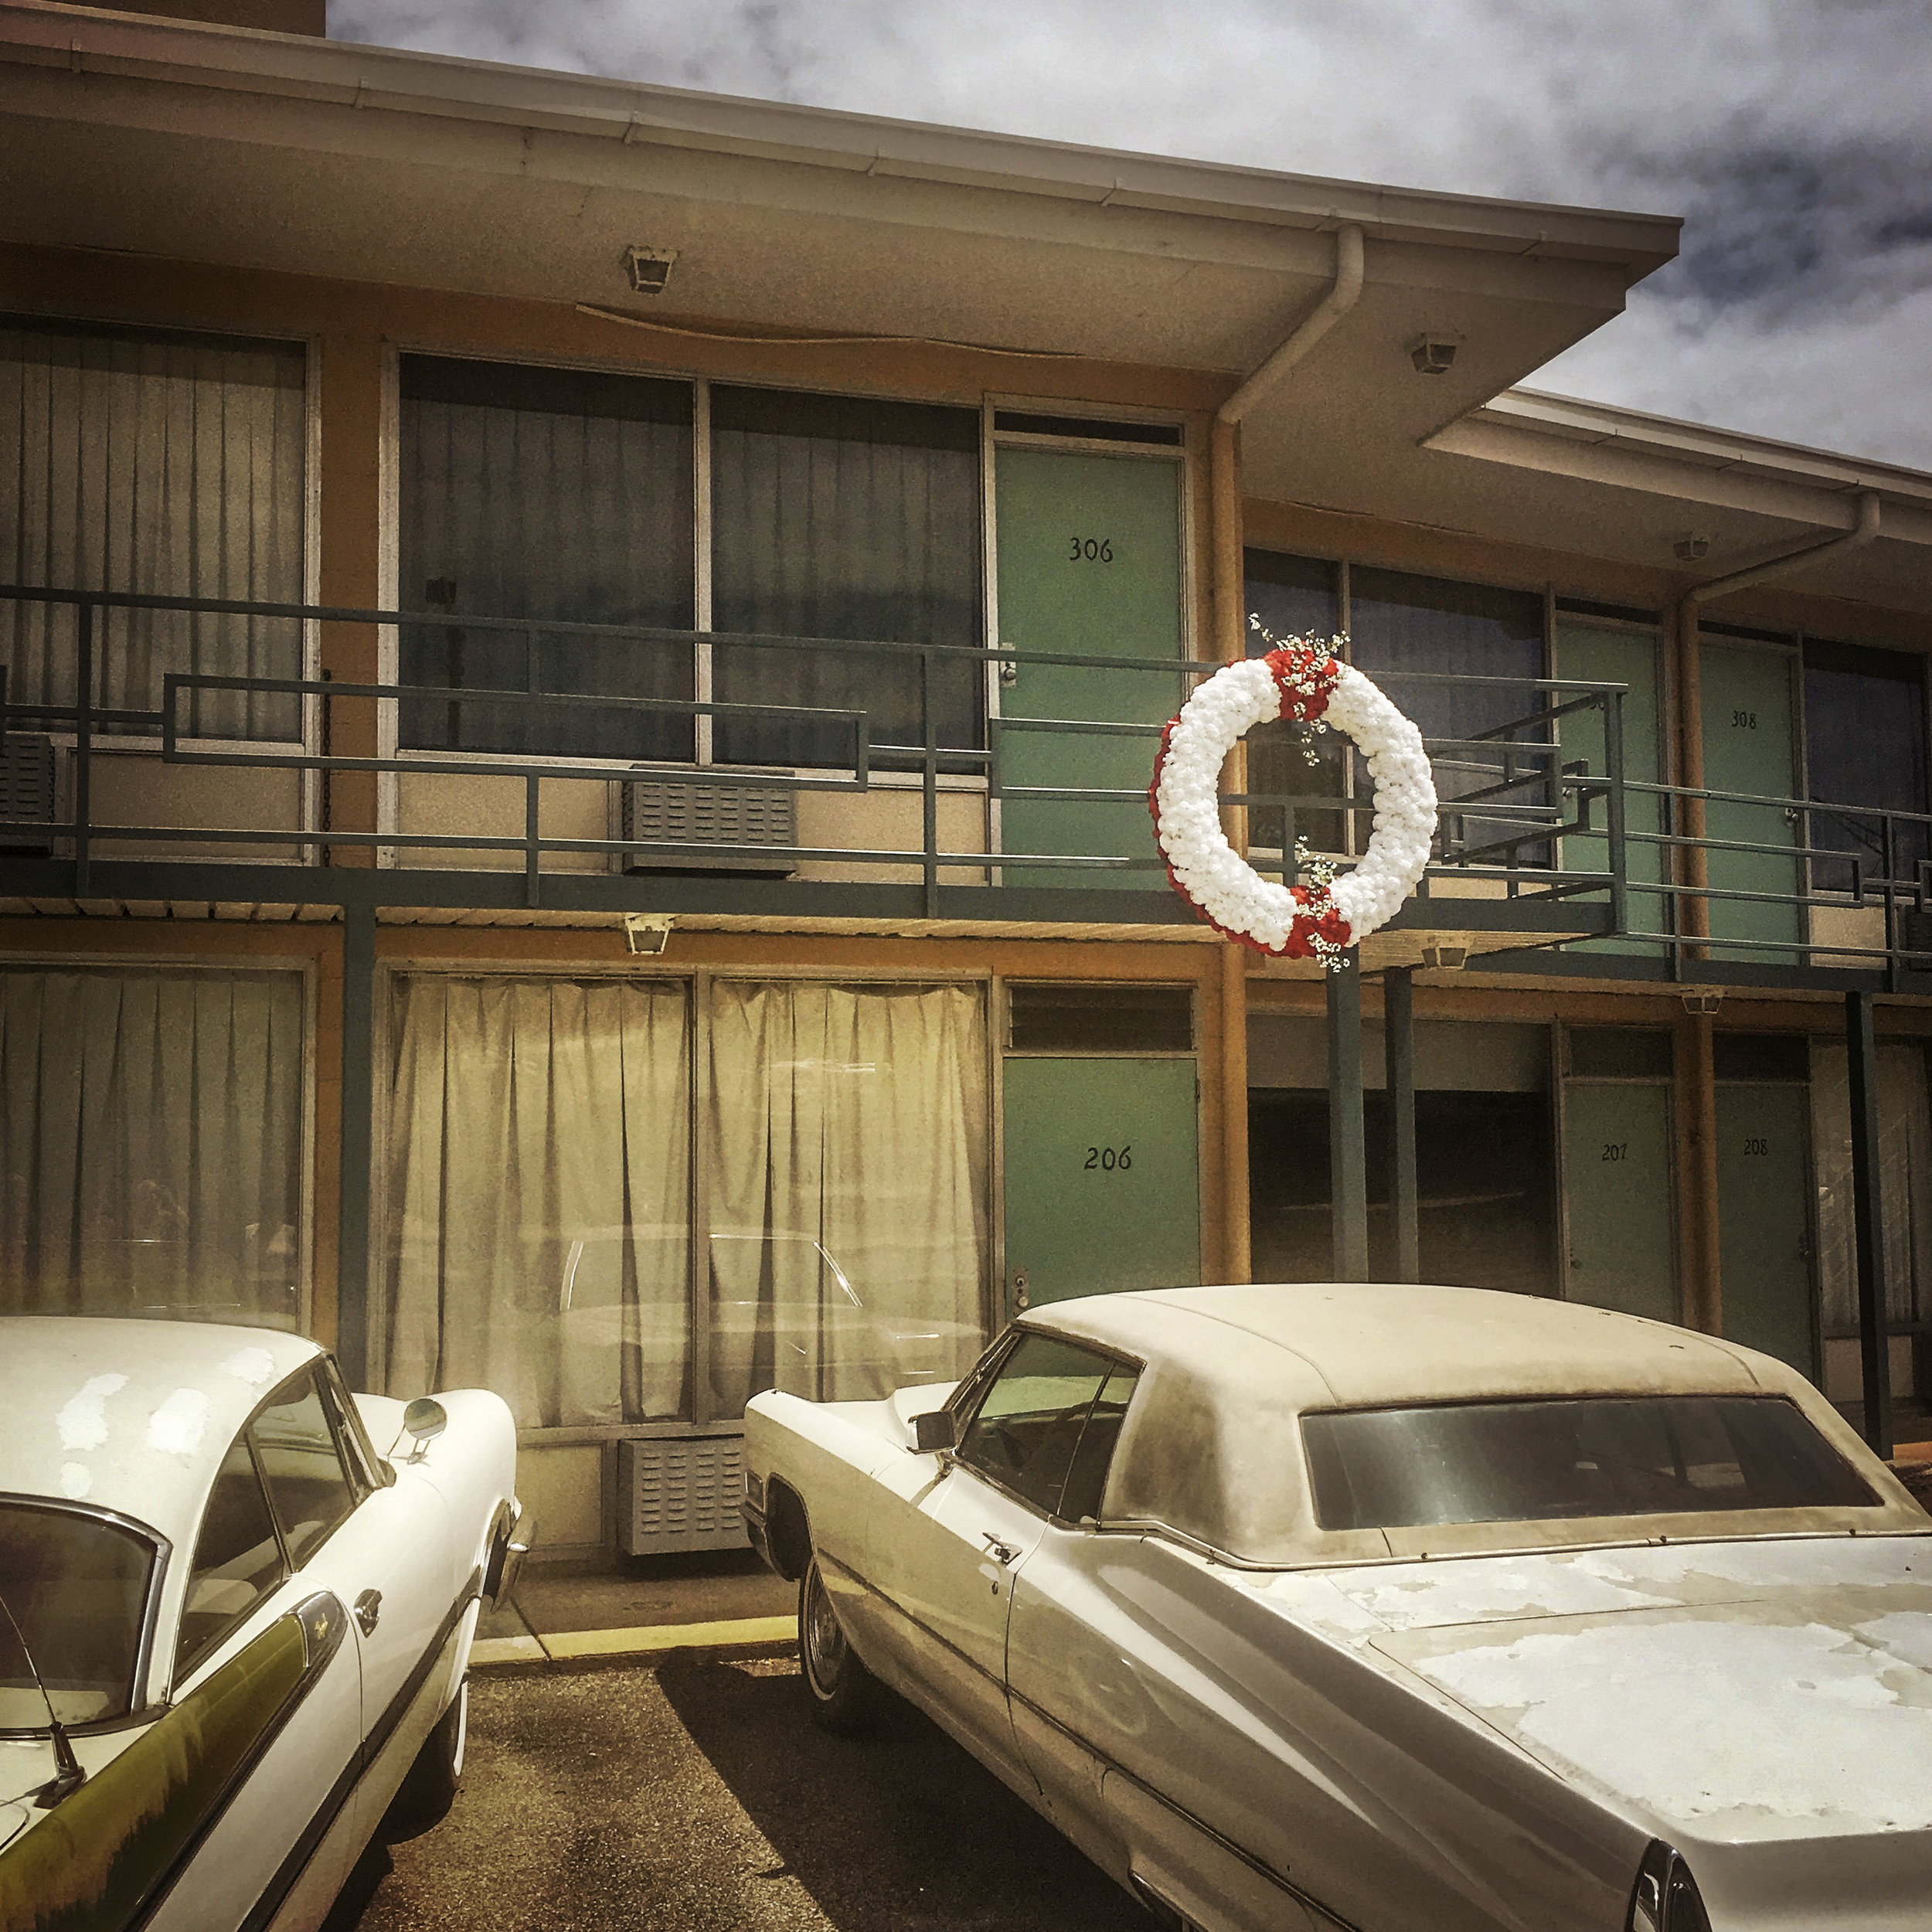 Lorraine Motel, Memphis, Tennessee, 2017